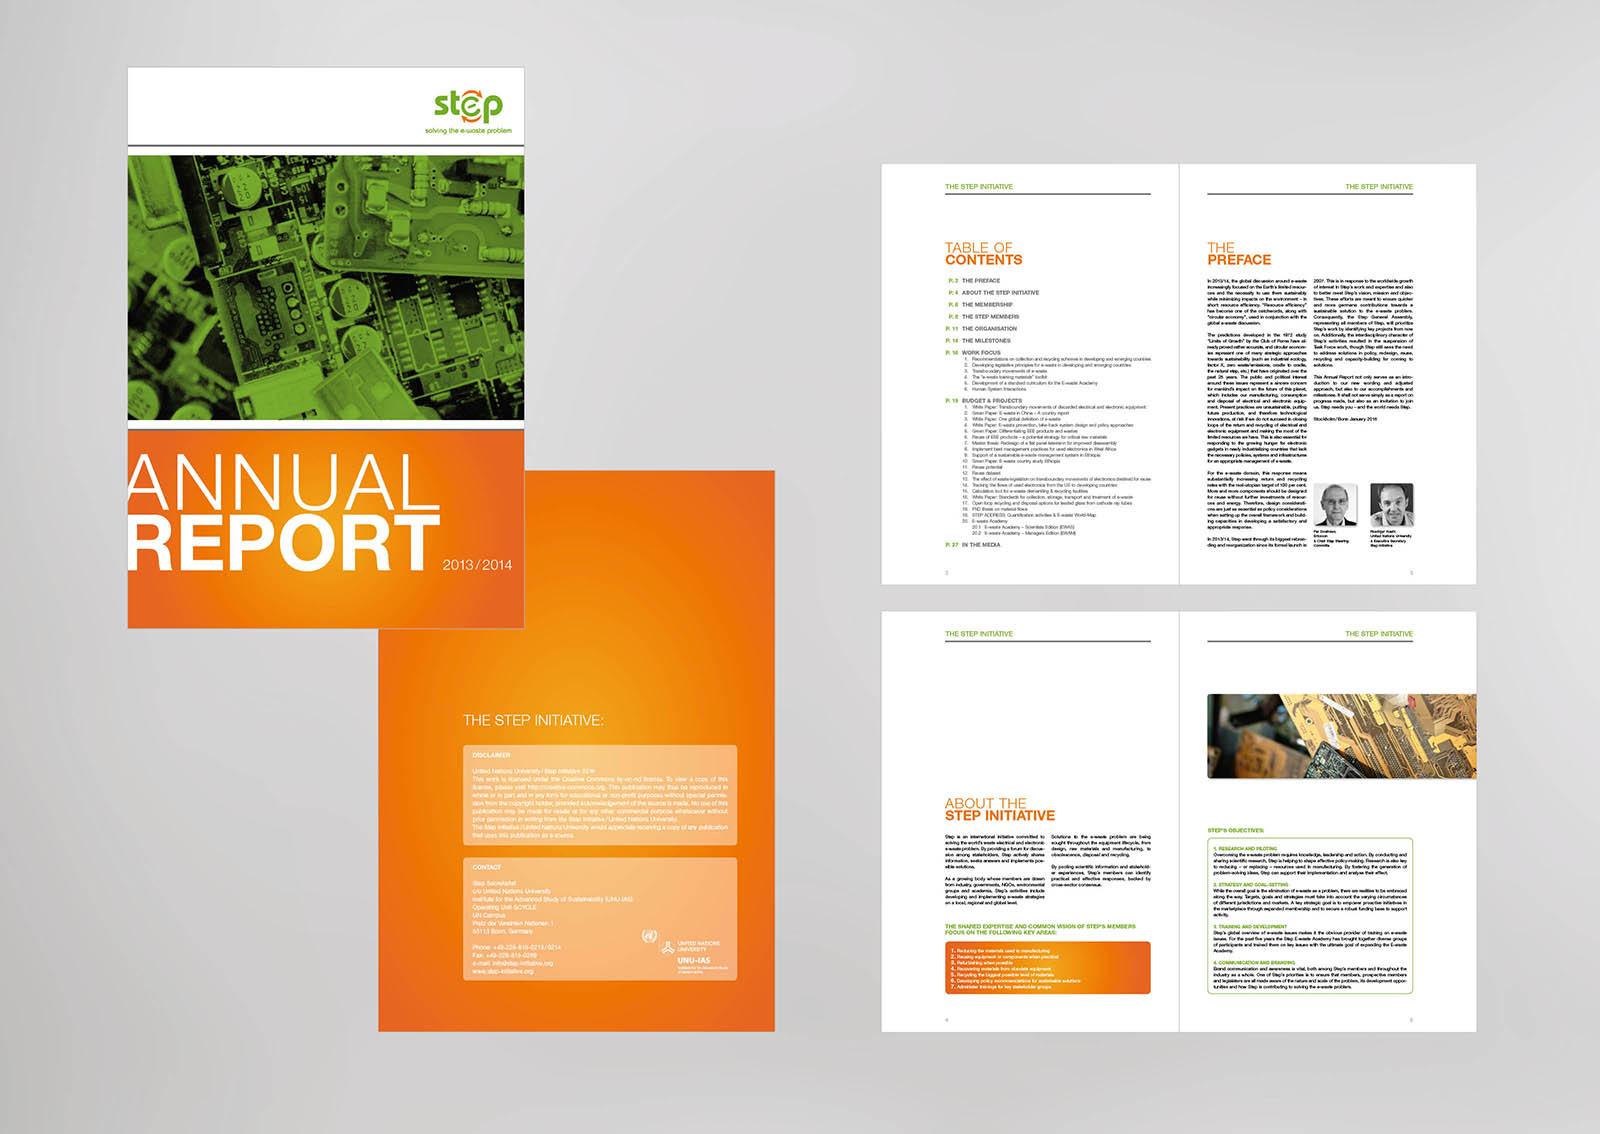 AnnualReport_StEP_2013_2014_01